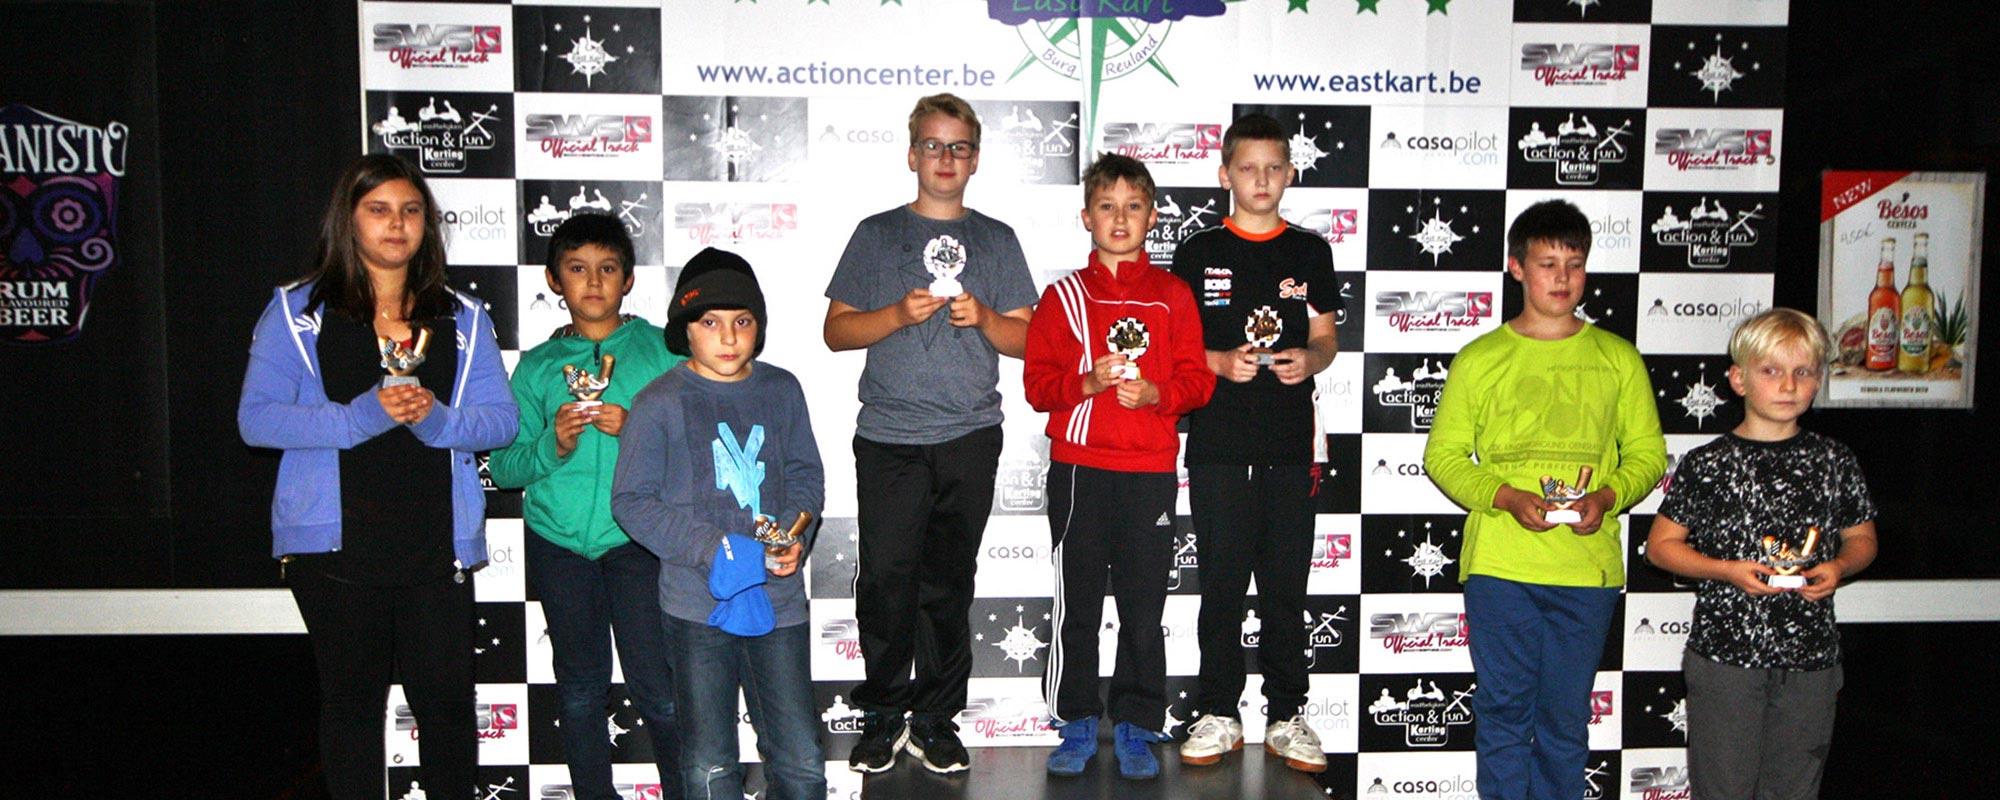 ebafkc-juniorkarting-2000x800-24